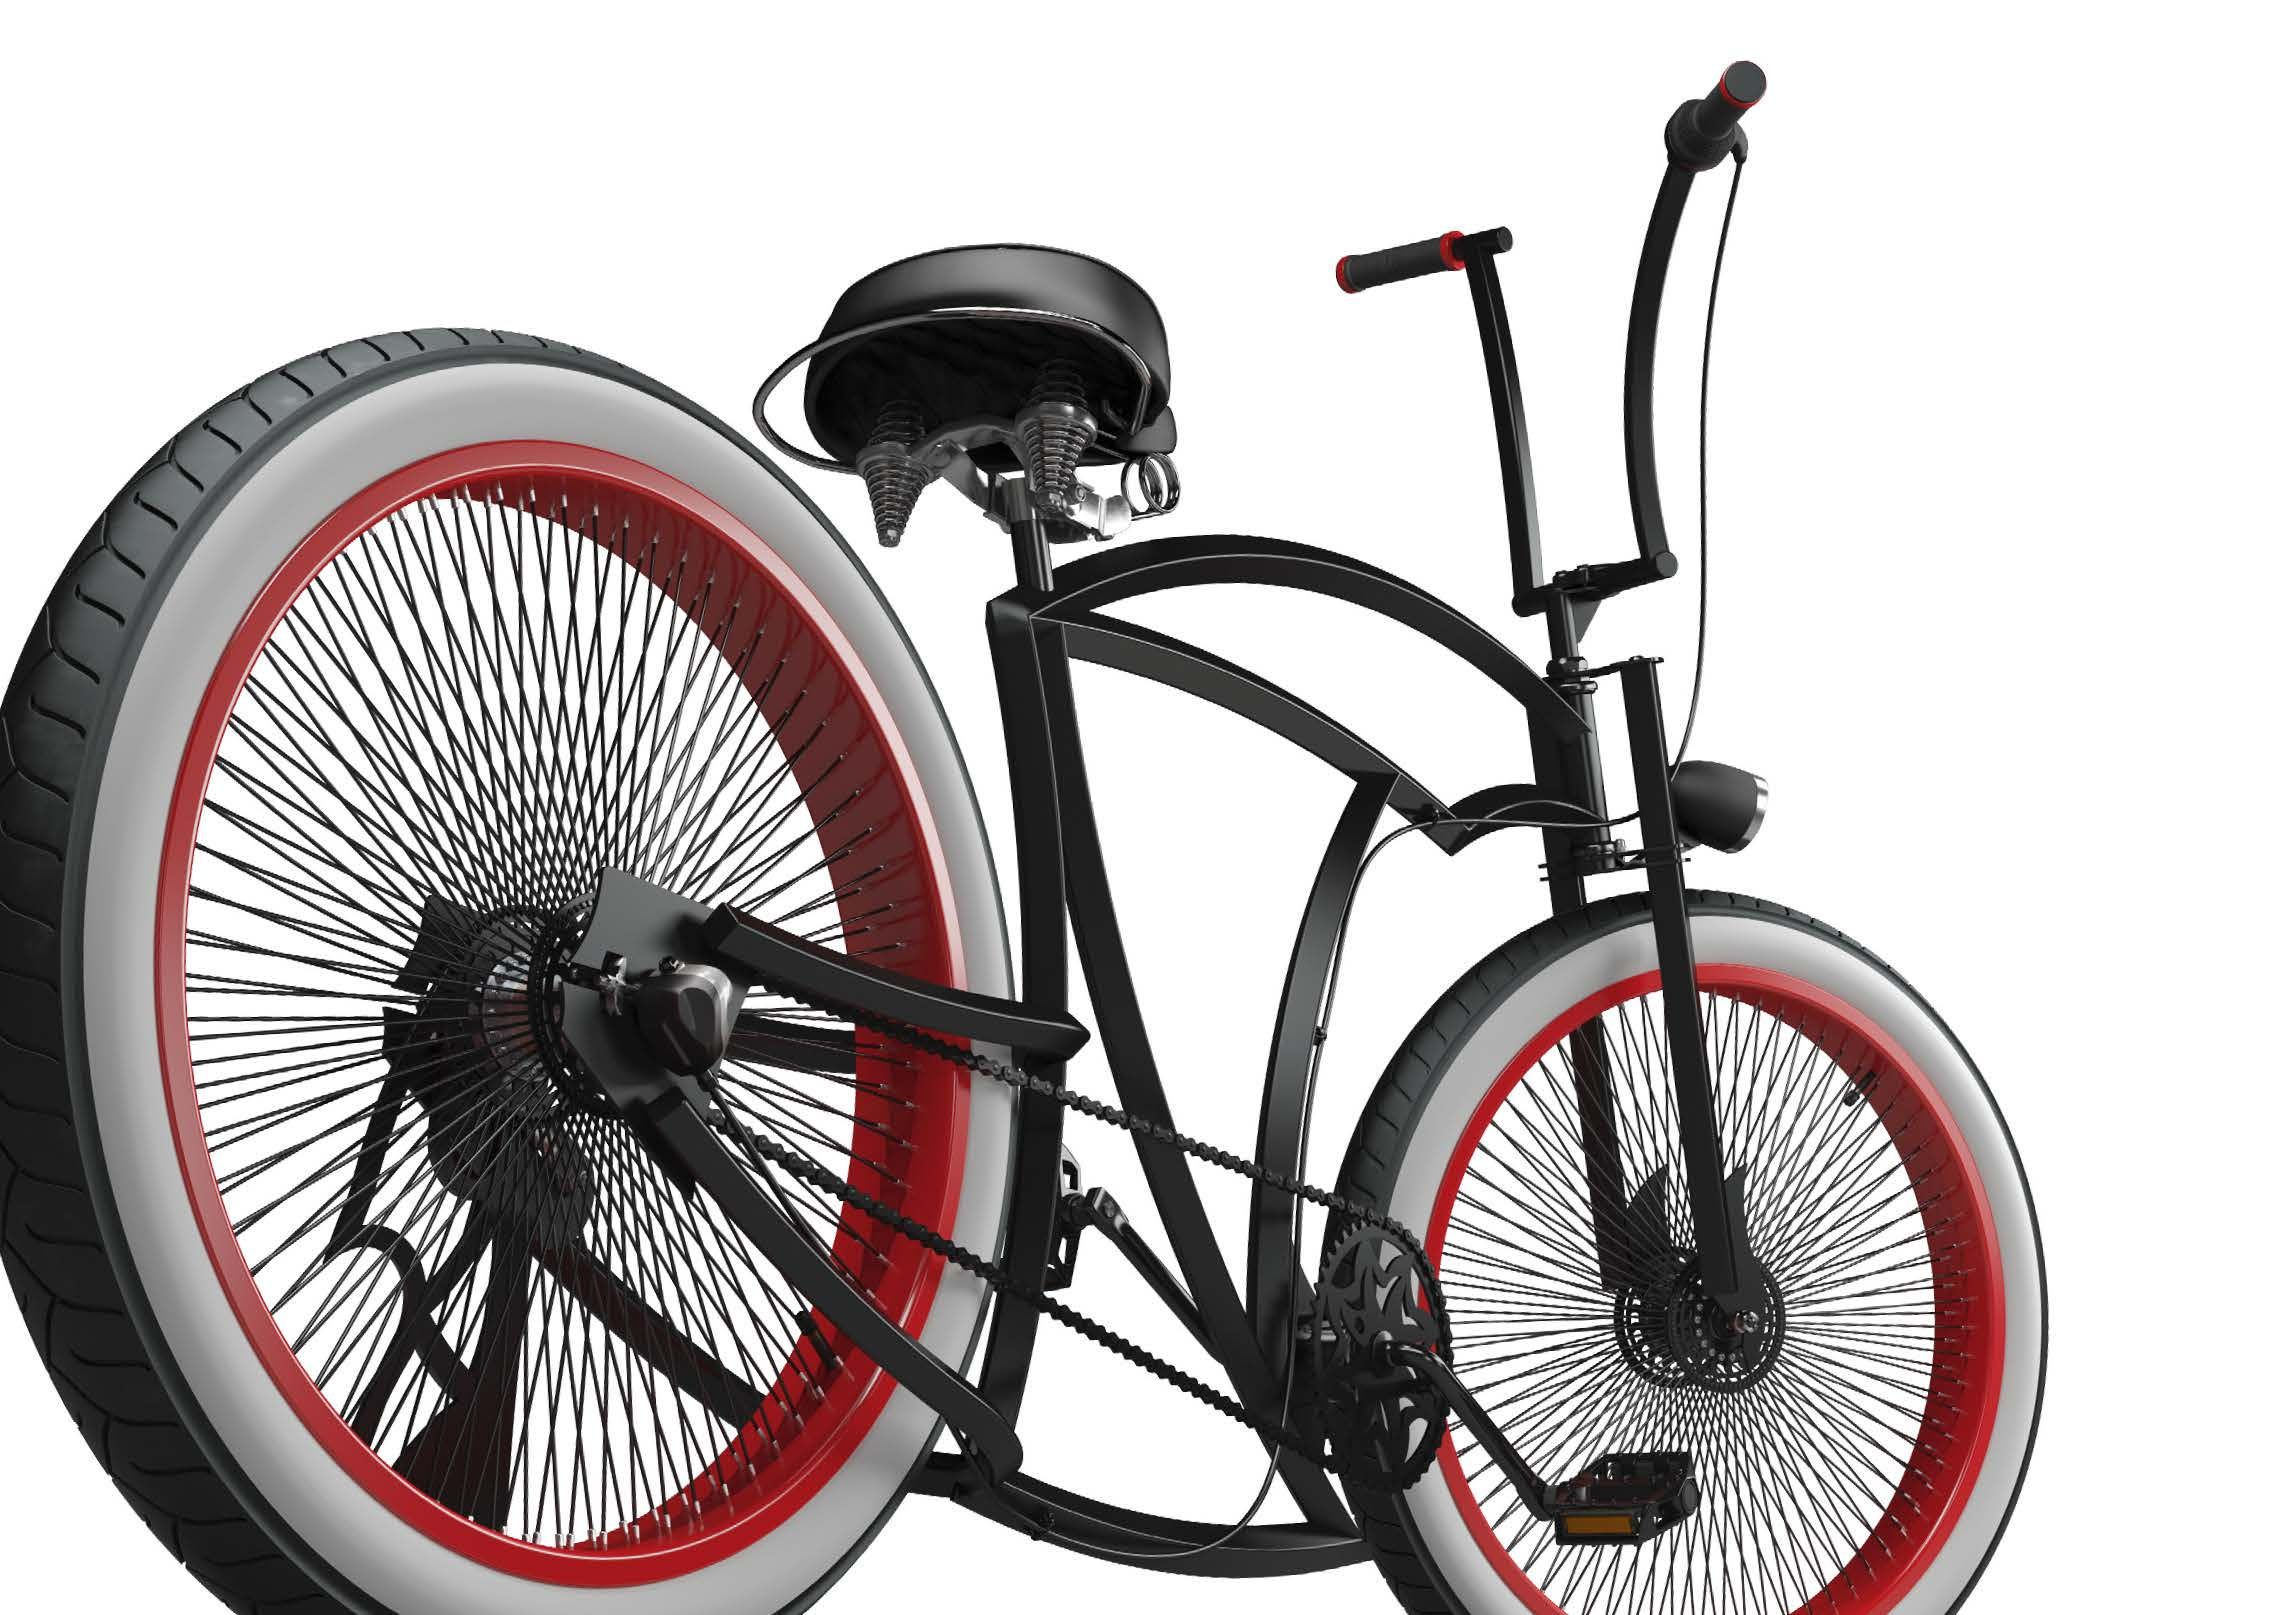 Pin De Wheel Cities Inc Em Design Research